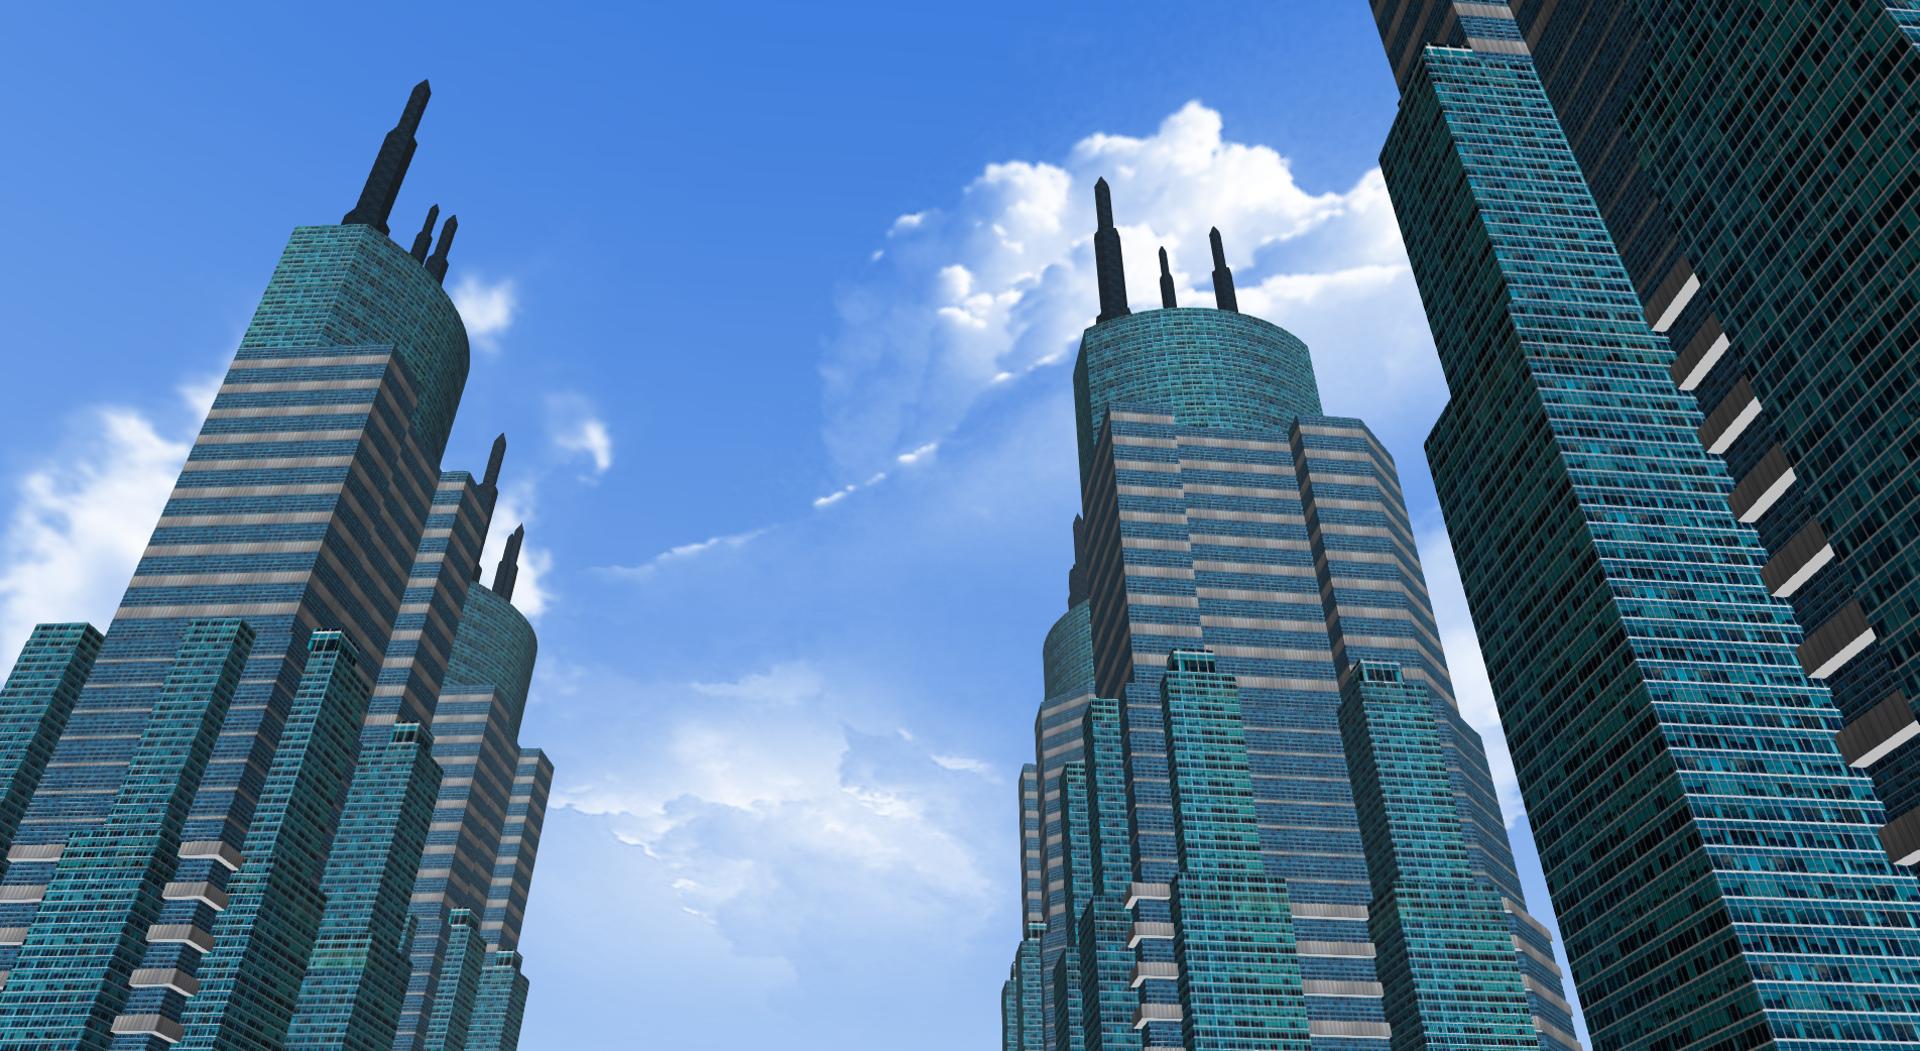 A Look At EU China Cooperation On Smart City DesignEURObiz